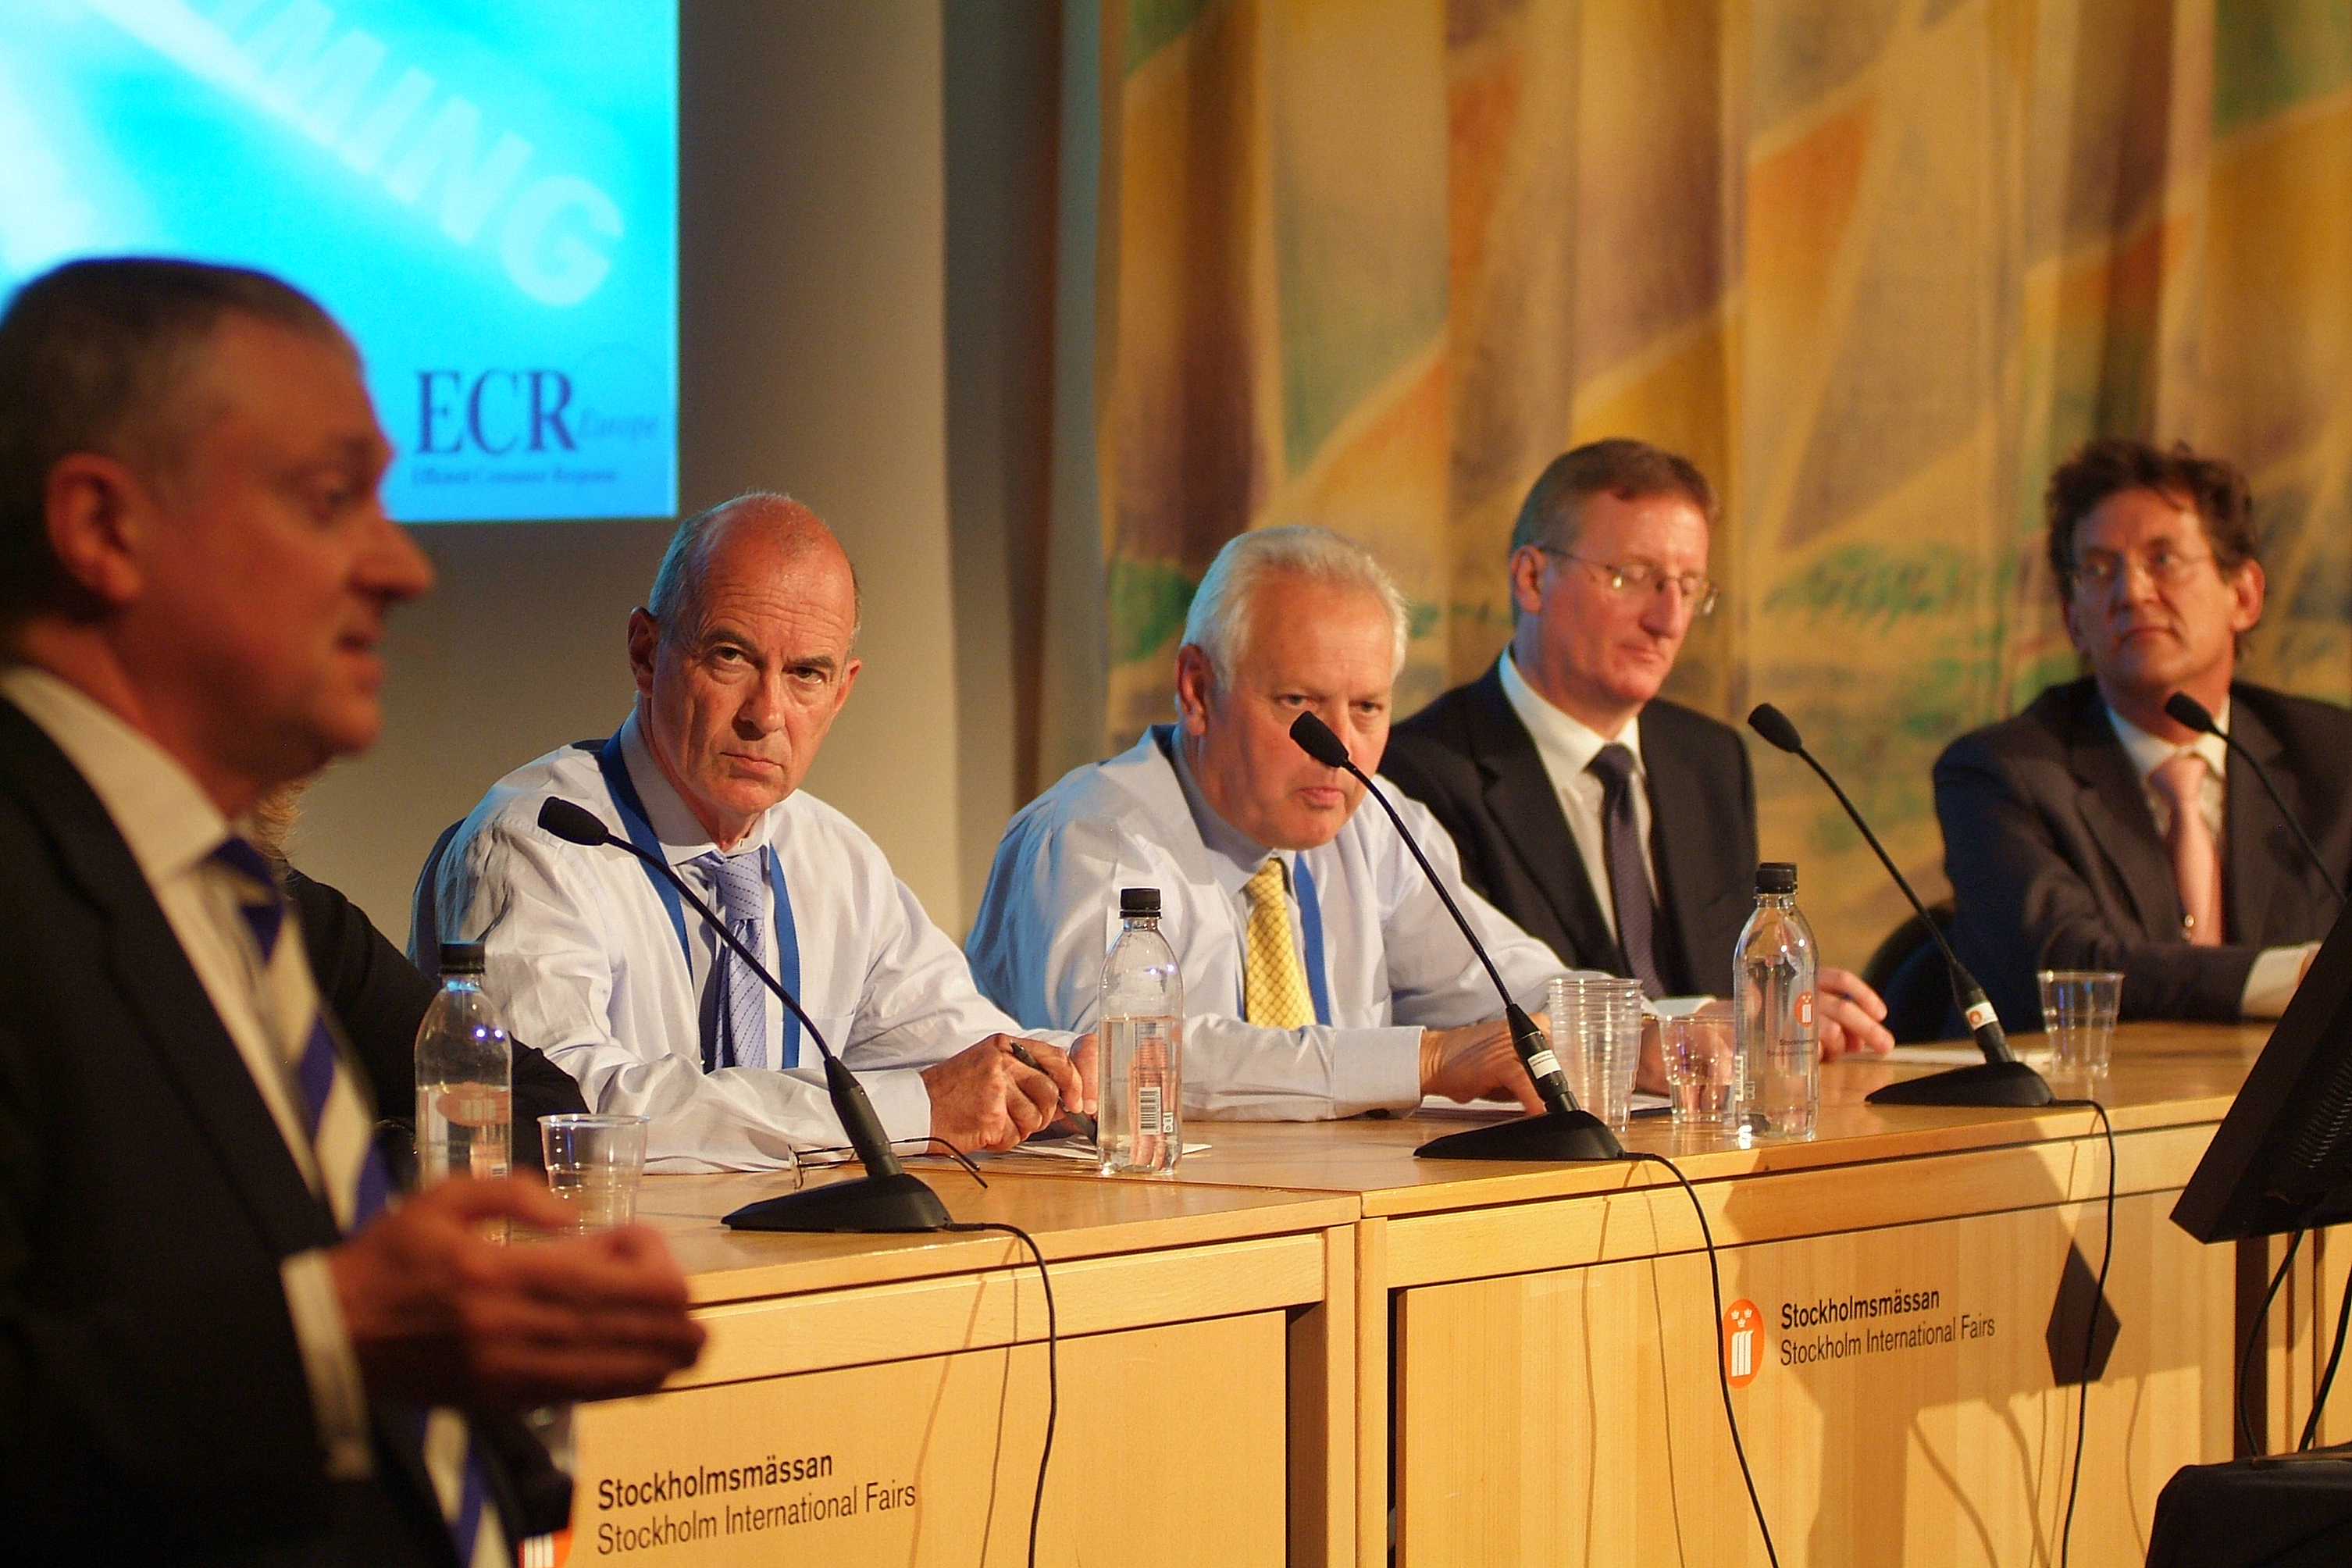 Stockholder meetings ACS audiovisual solutions